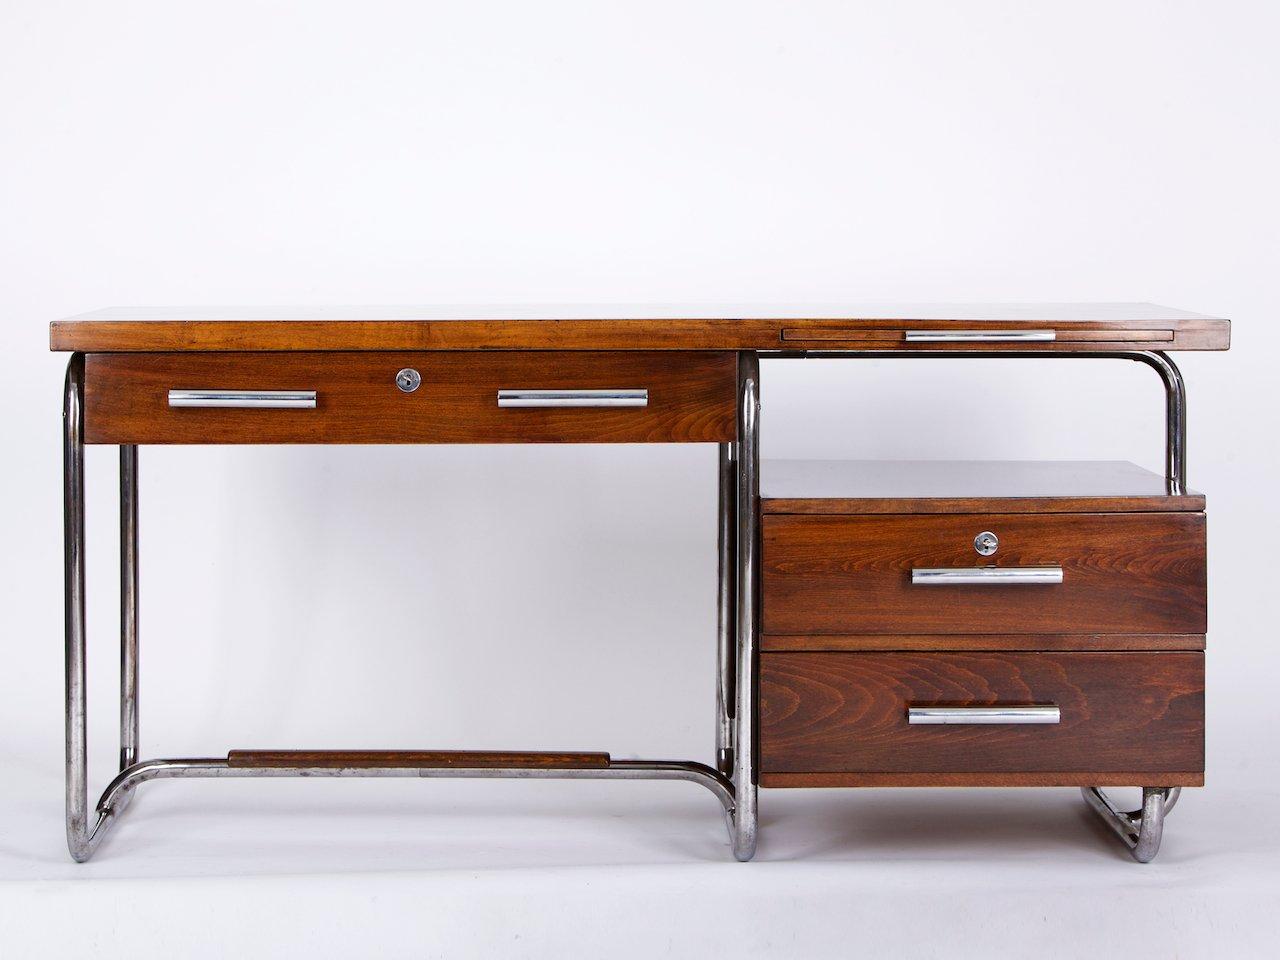 bauhaus furniture sofa. Black Bedroom Furniture Sets. Home Design Ideas